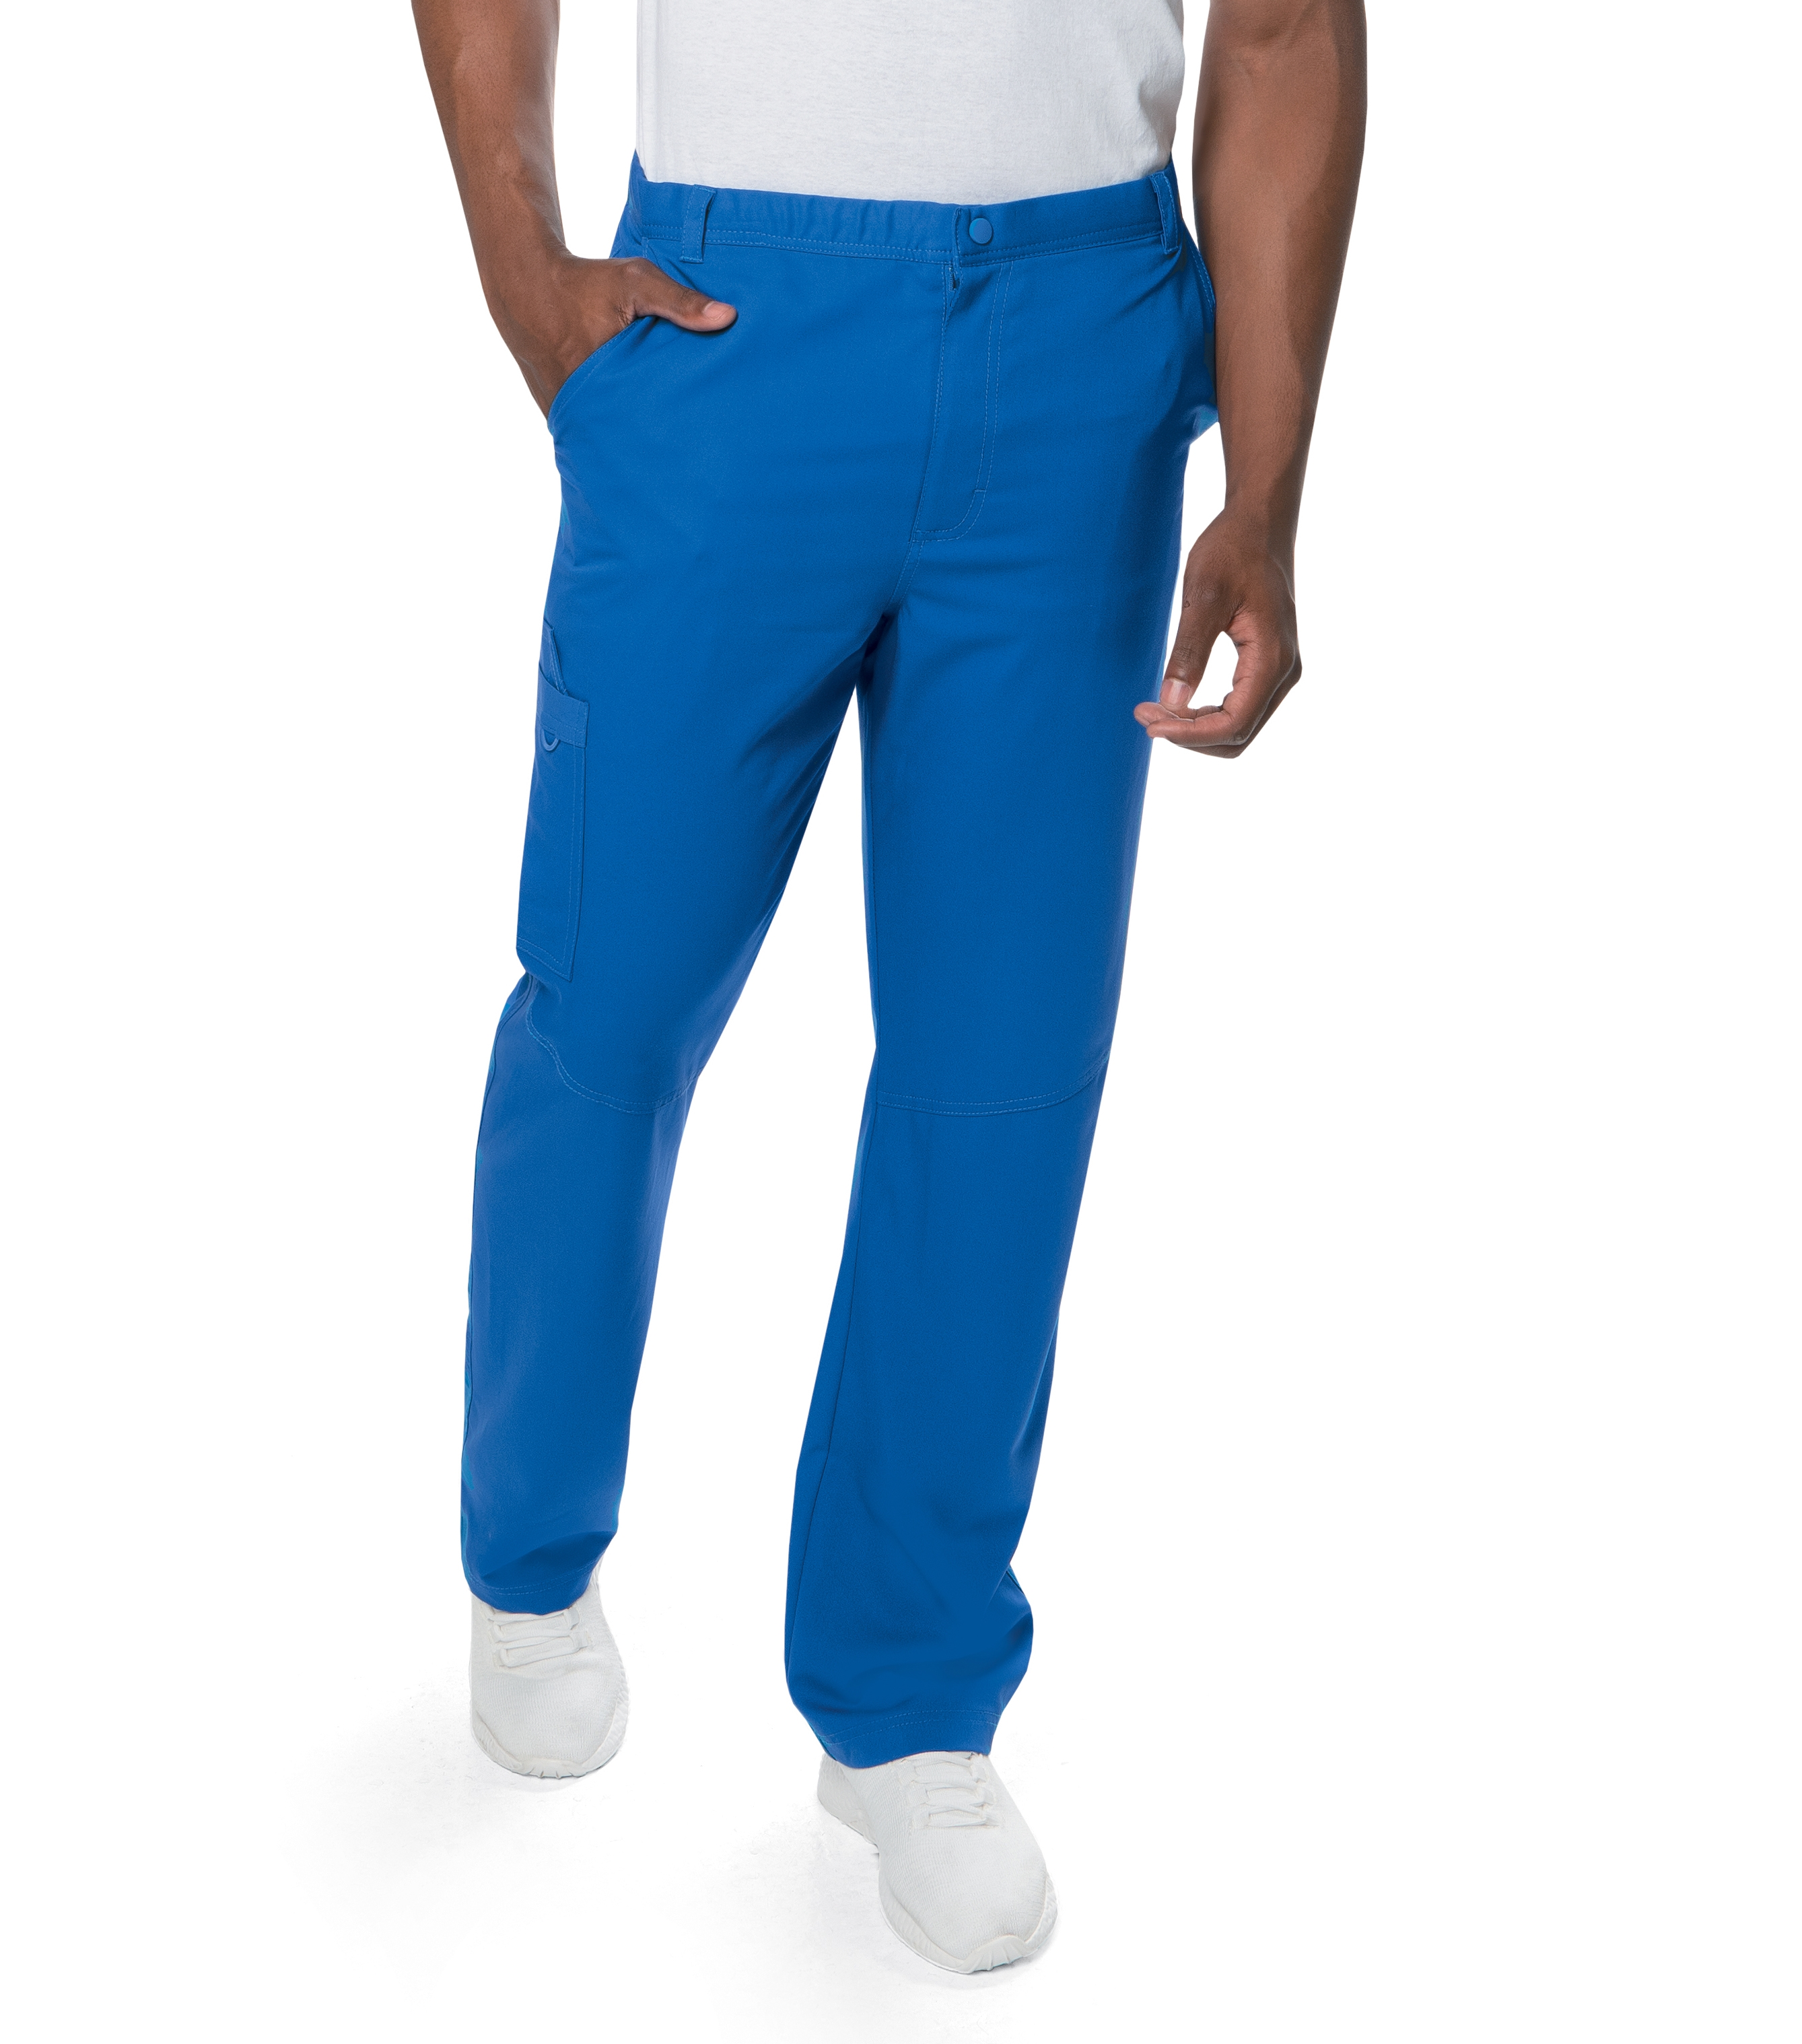 Urbane Ultimate Men's Cargo Stretch 6 Pocket Scrub Pants- 9252